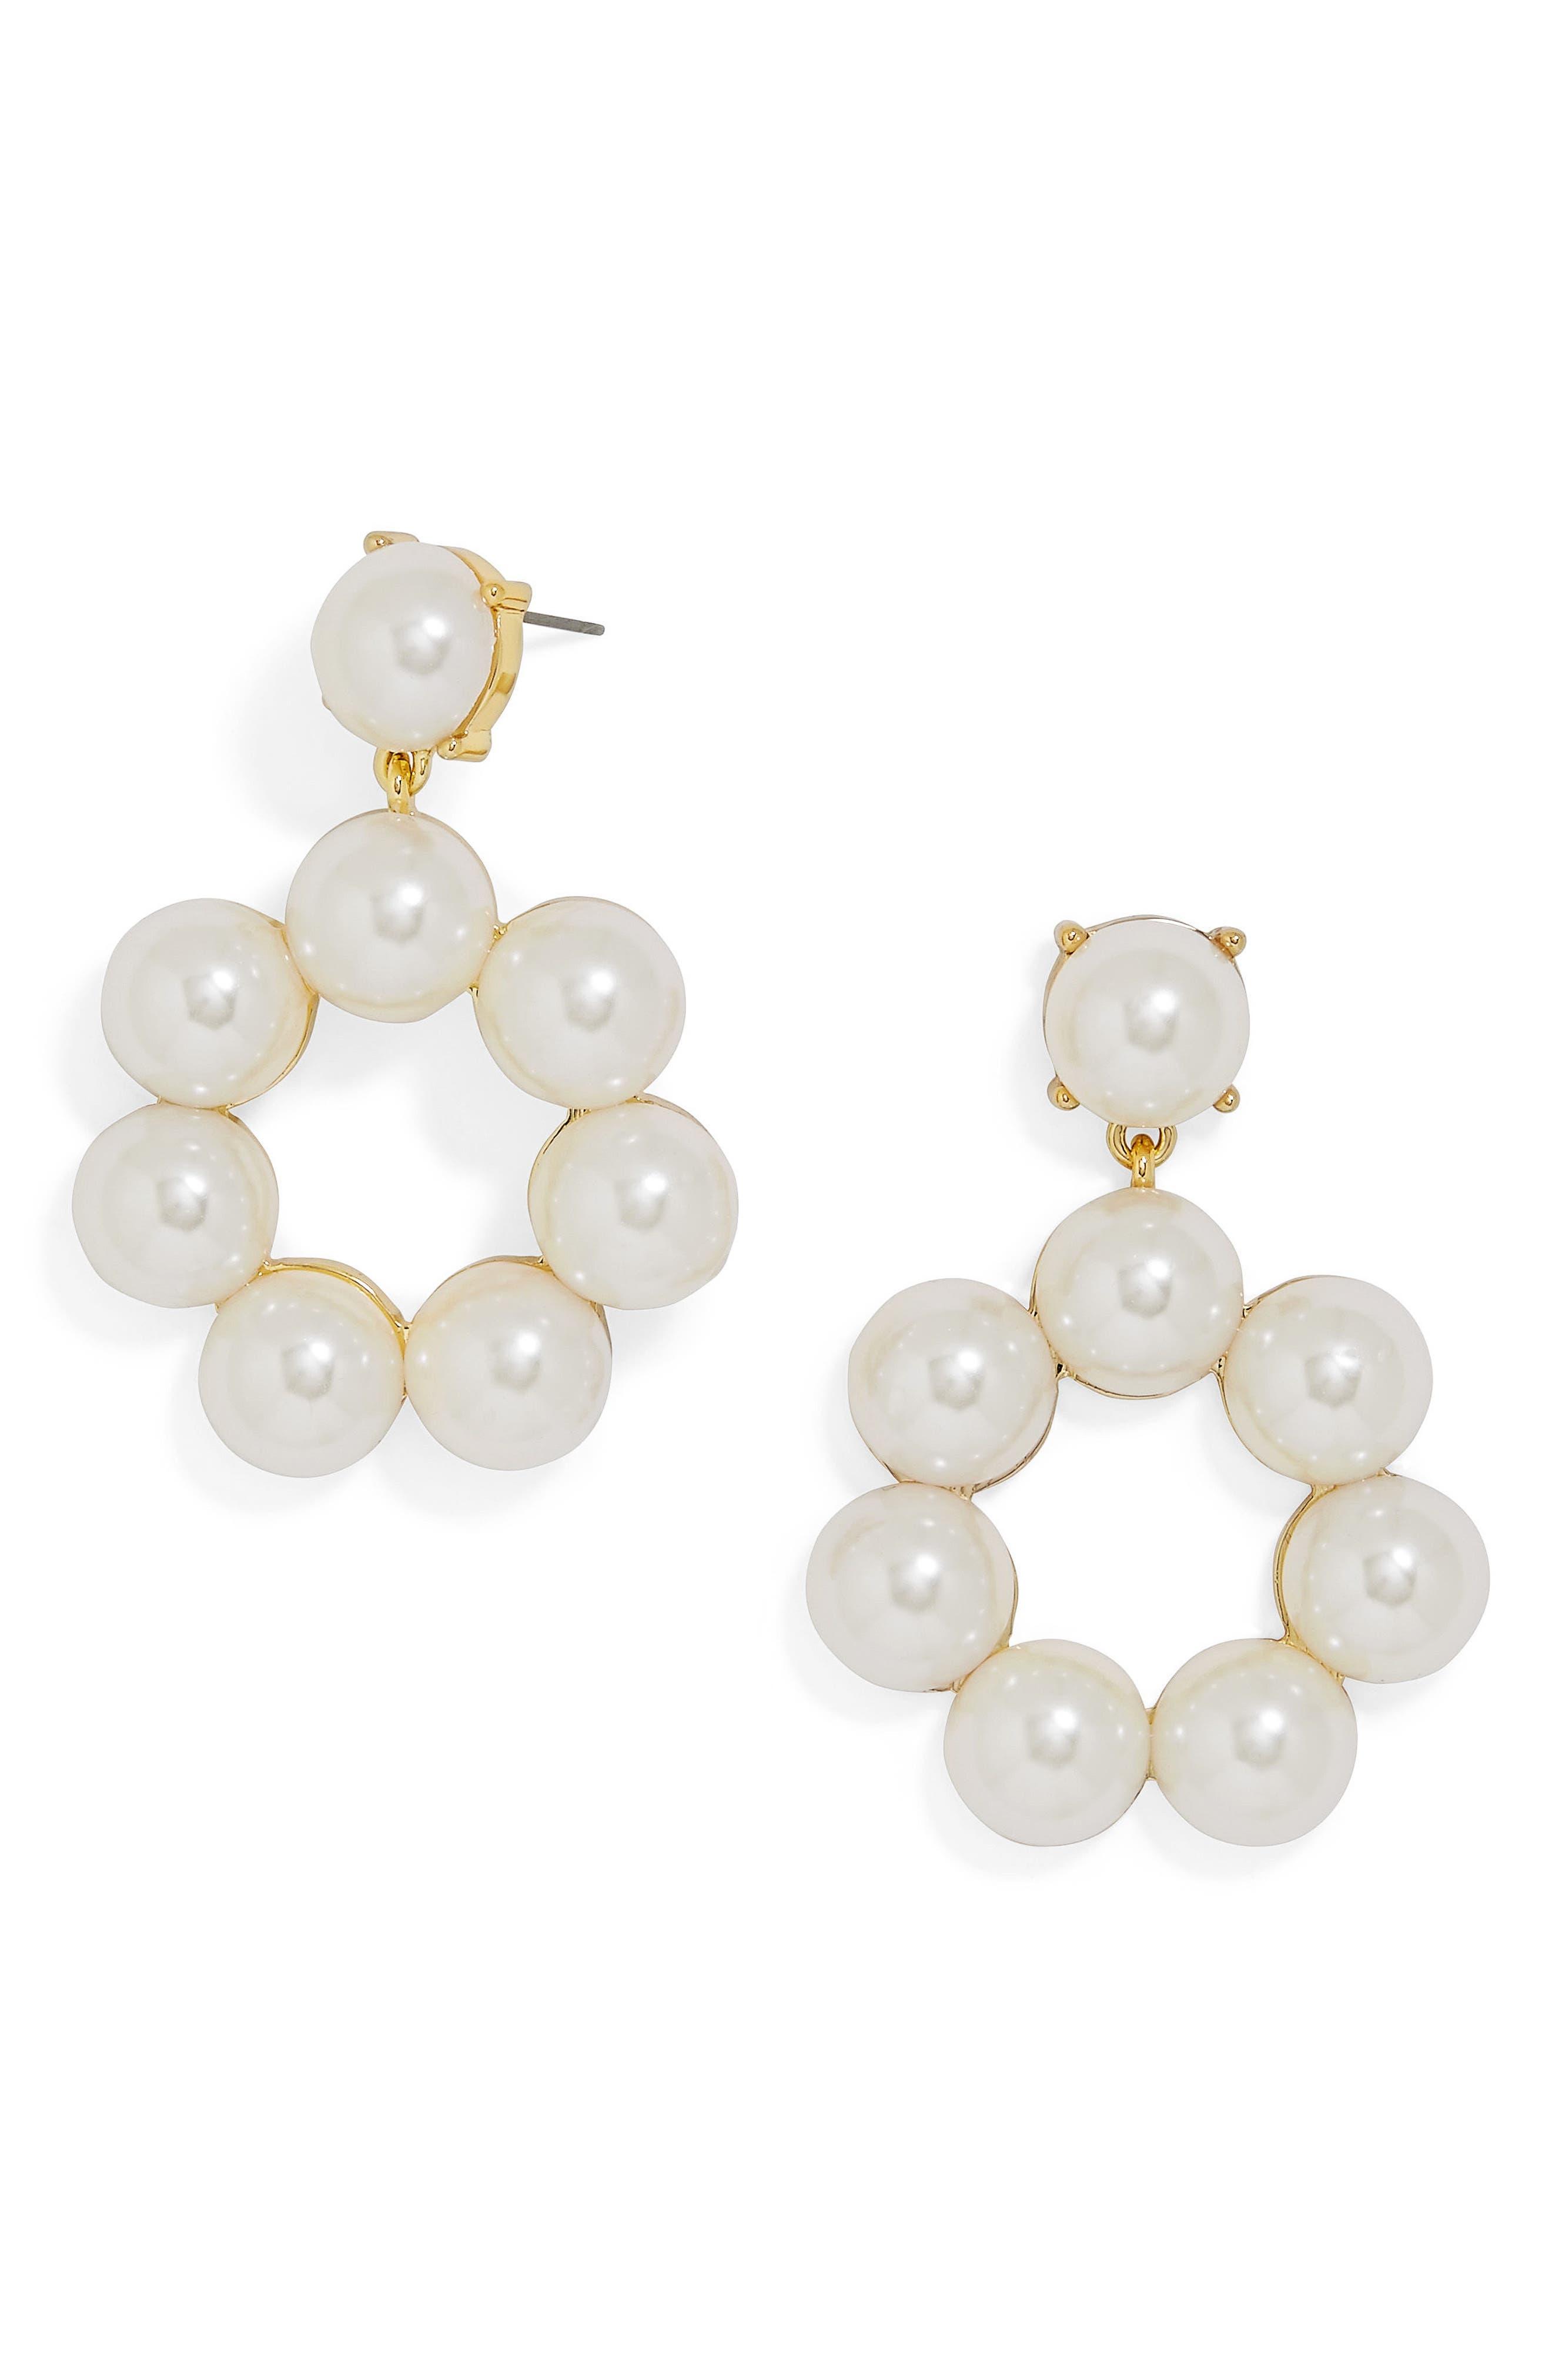 Main Image - BaubleBar Aleeza Imitation Pearl Drop Earrings